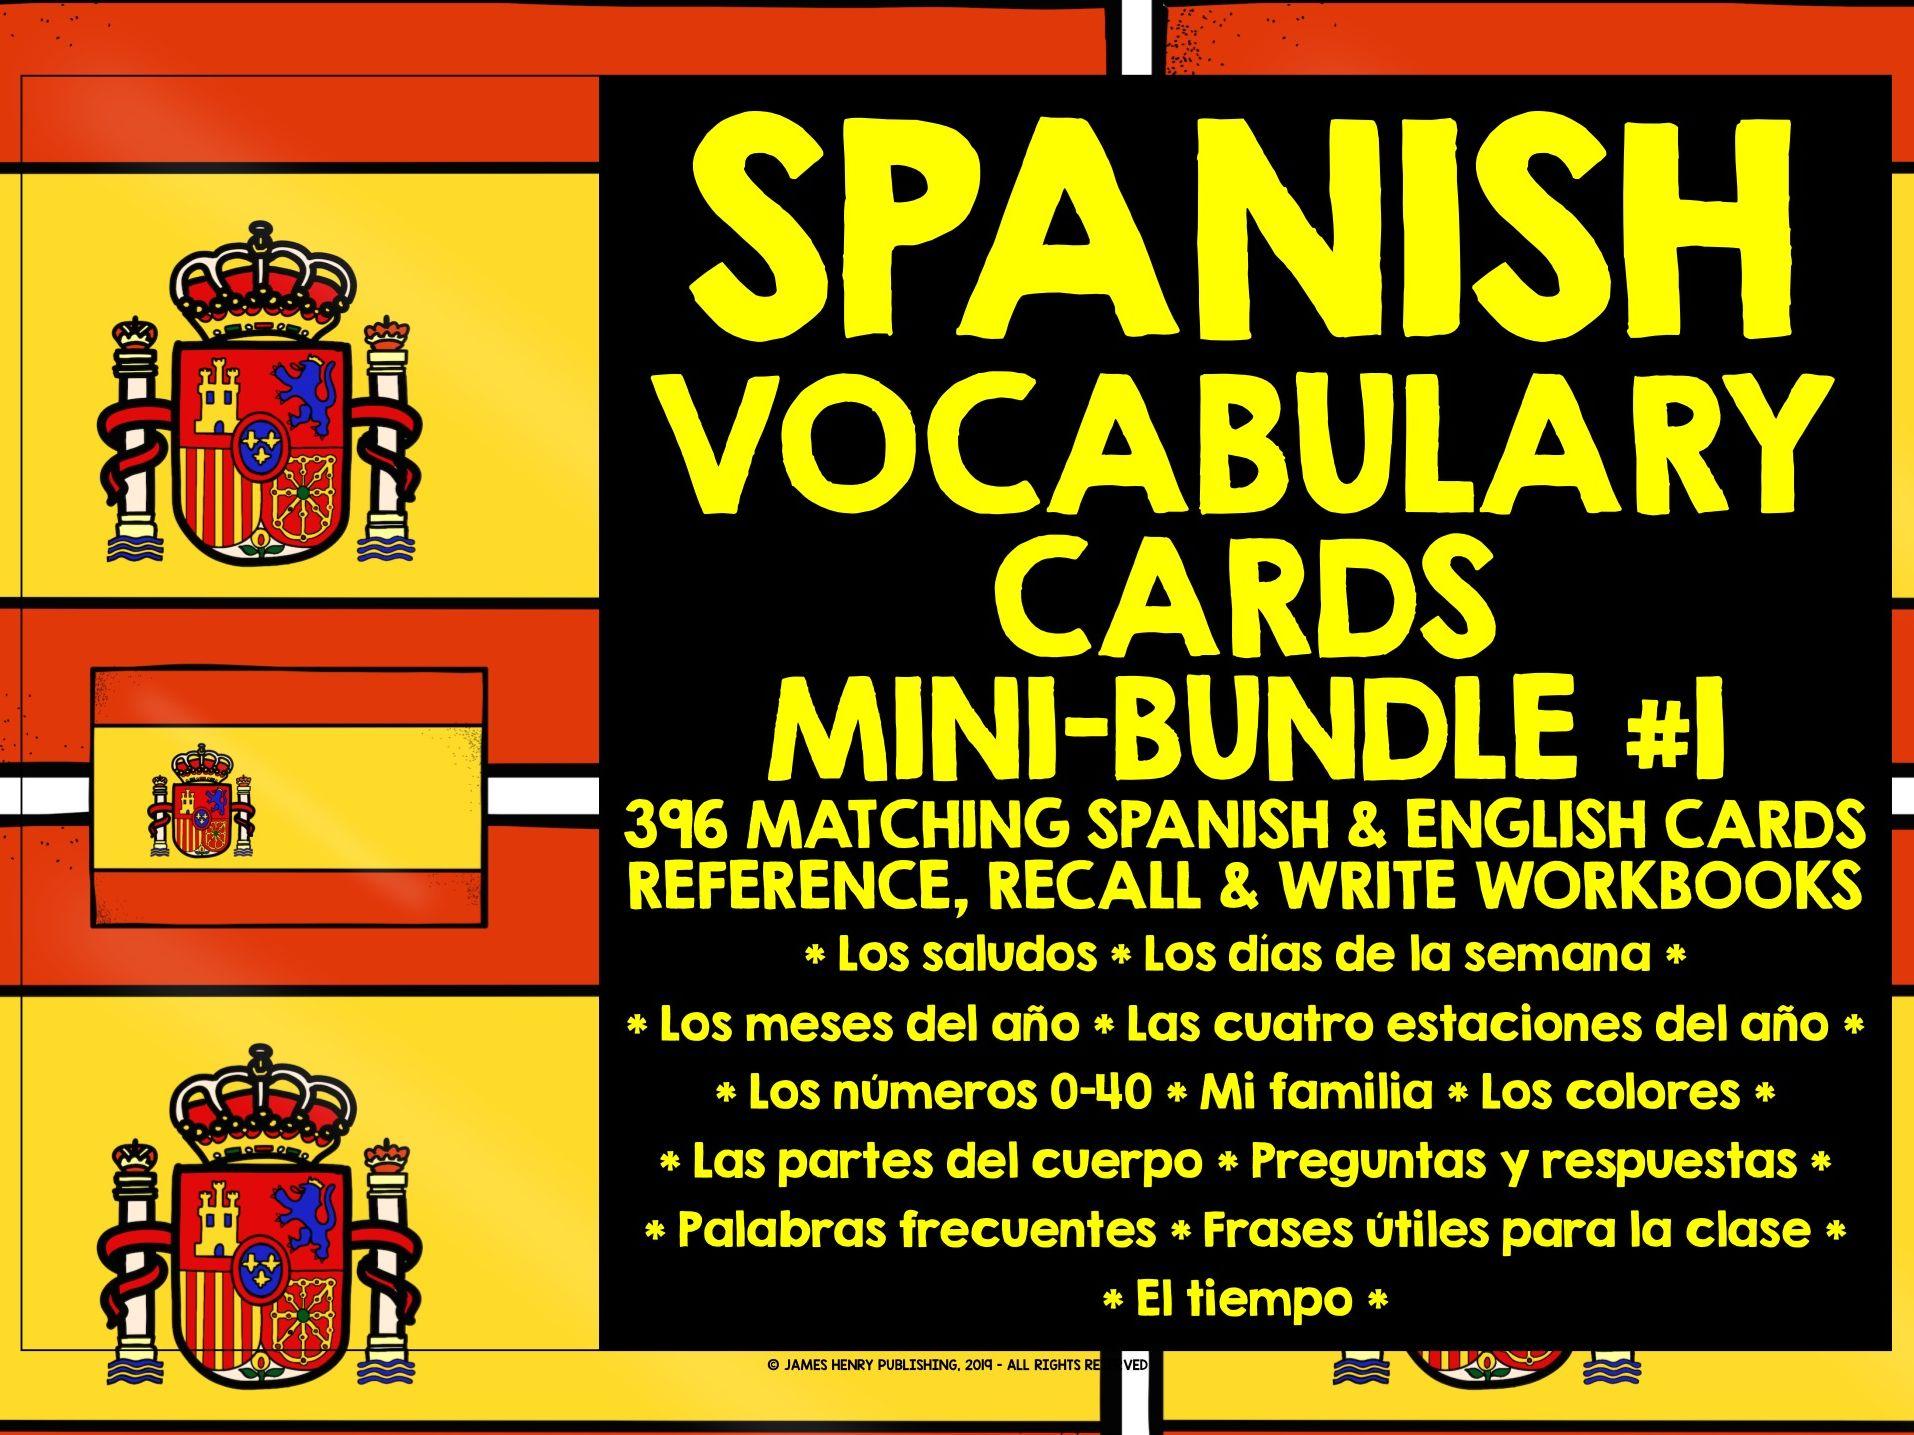 SPANISH VOCABULARY CARDS MINI-BUNDLE